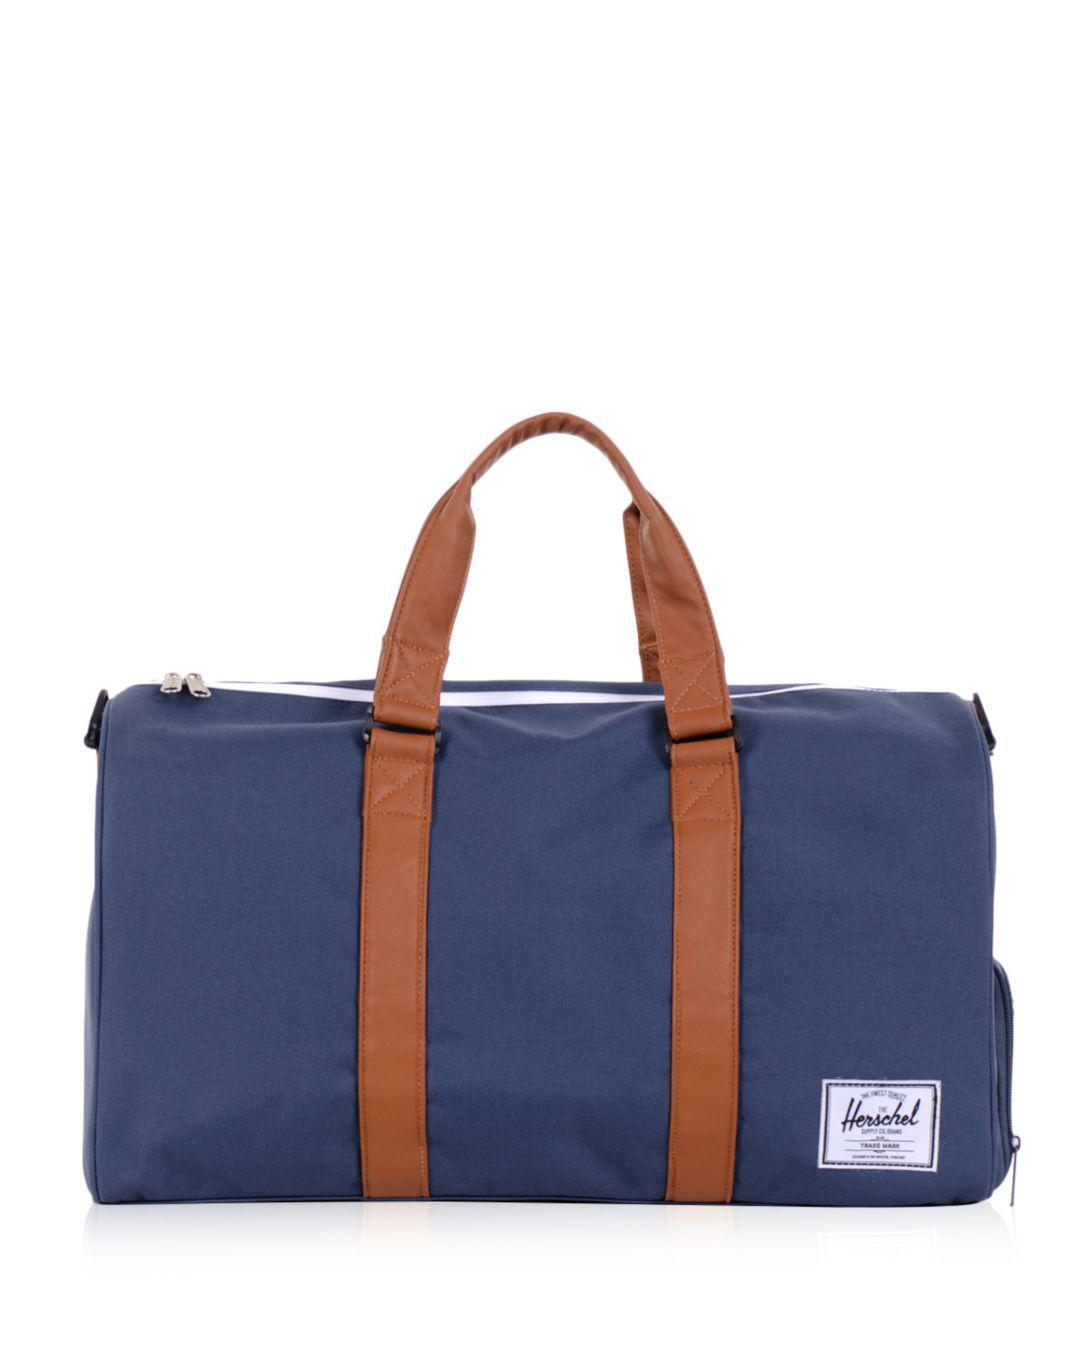 d88a795daf Lyst - Herschel Supply Co. Novel Duffel in Blue for Men